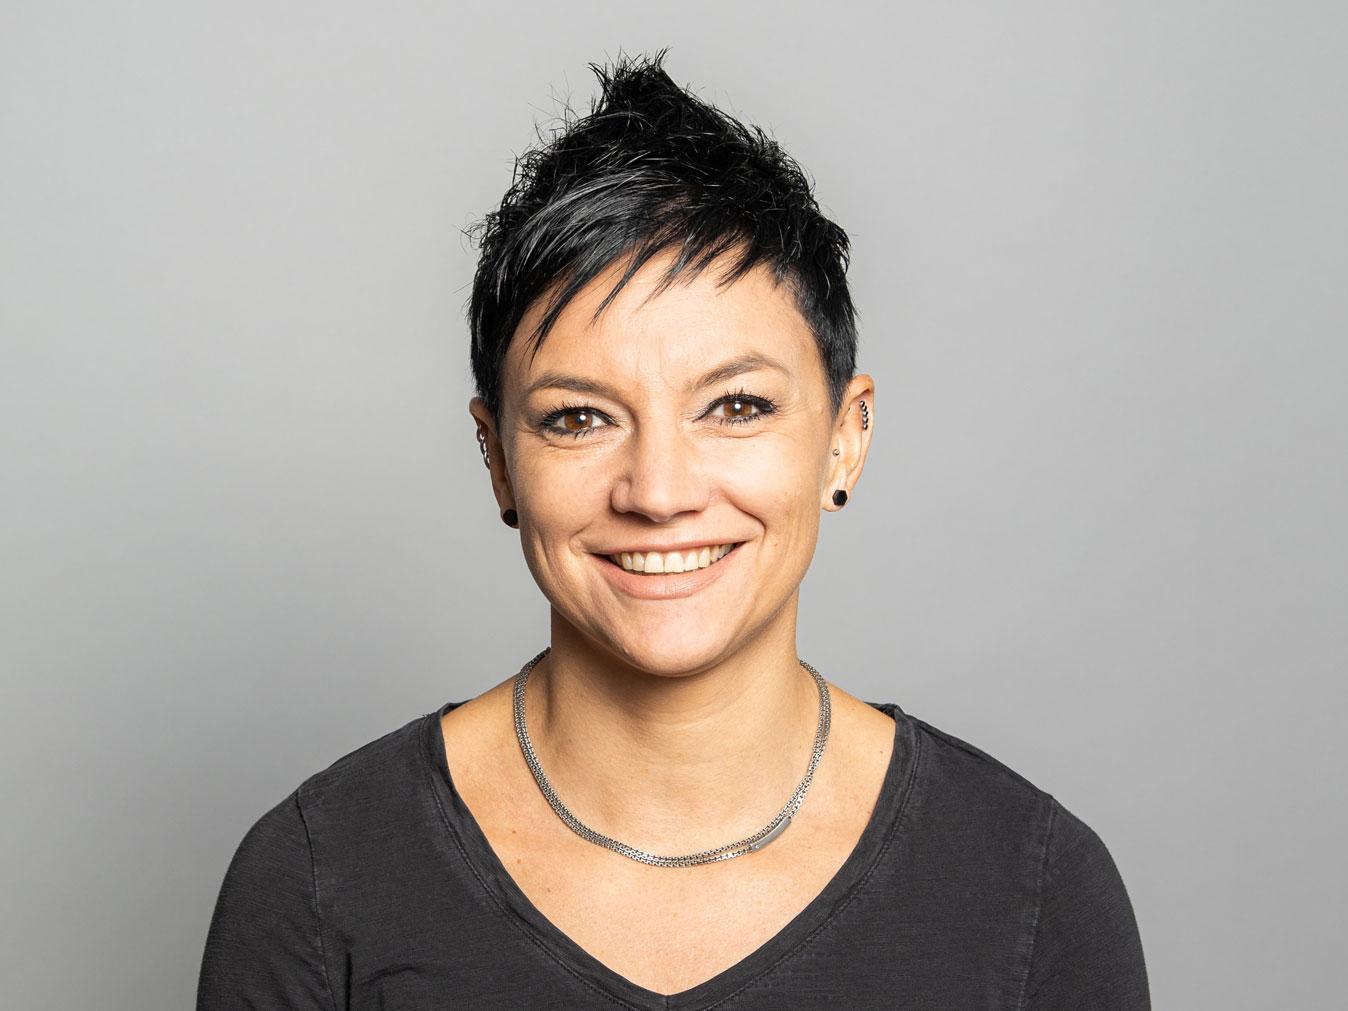 Miriam Märtens